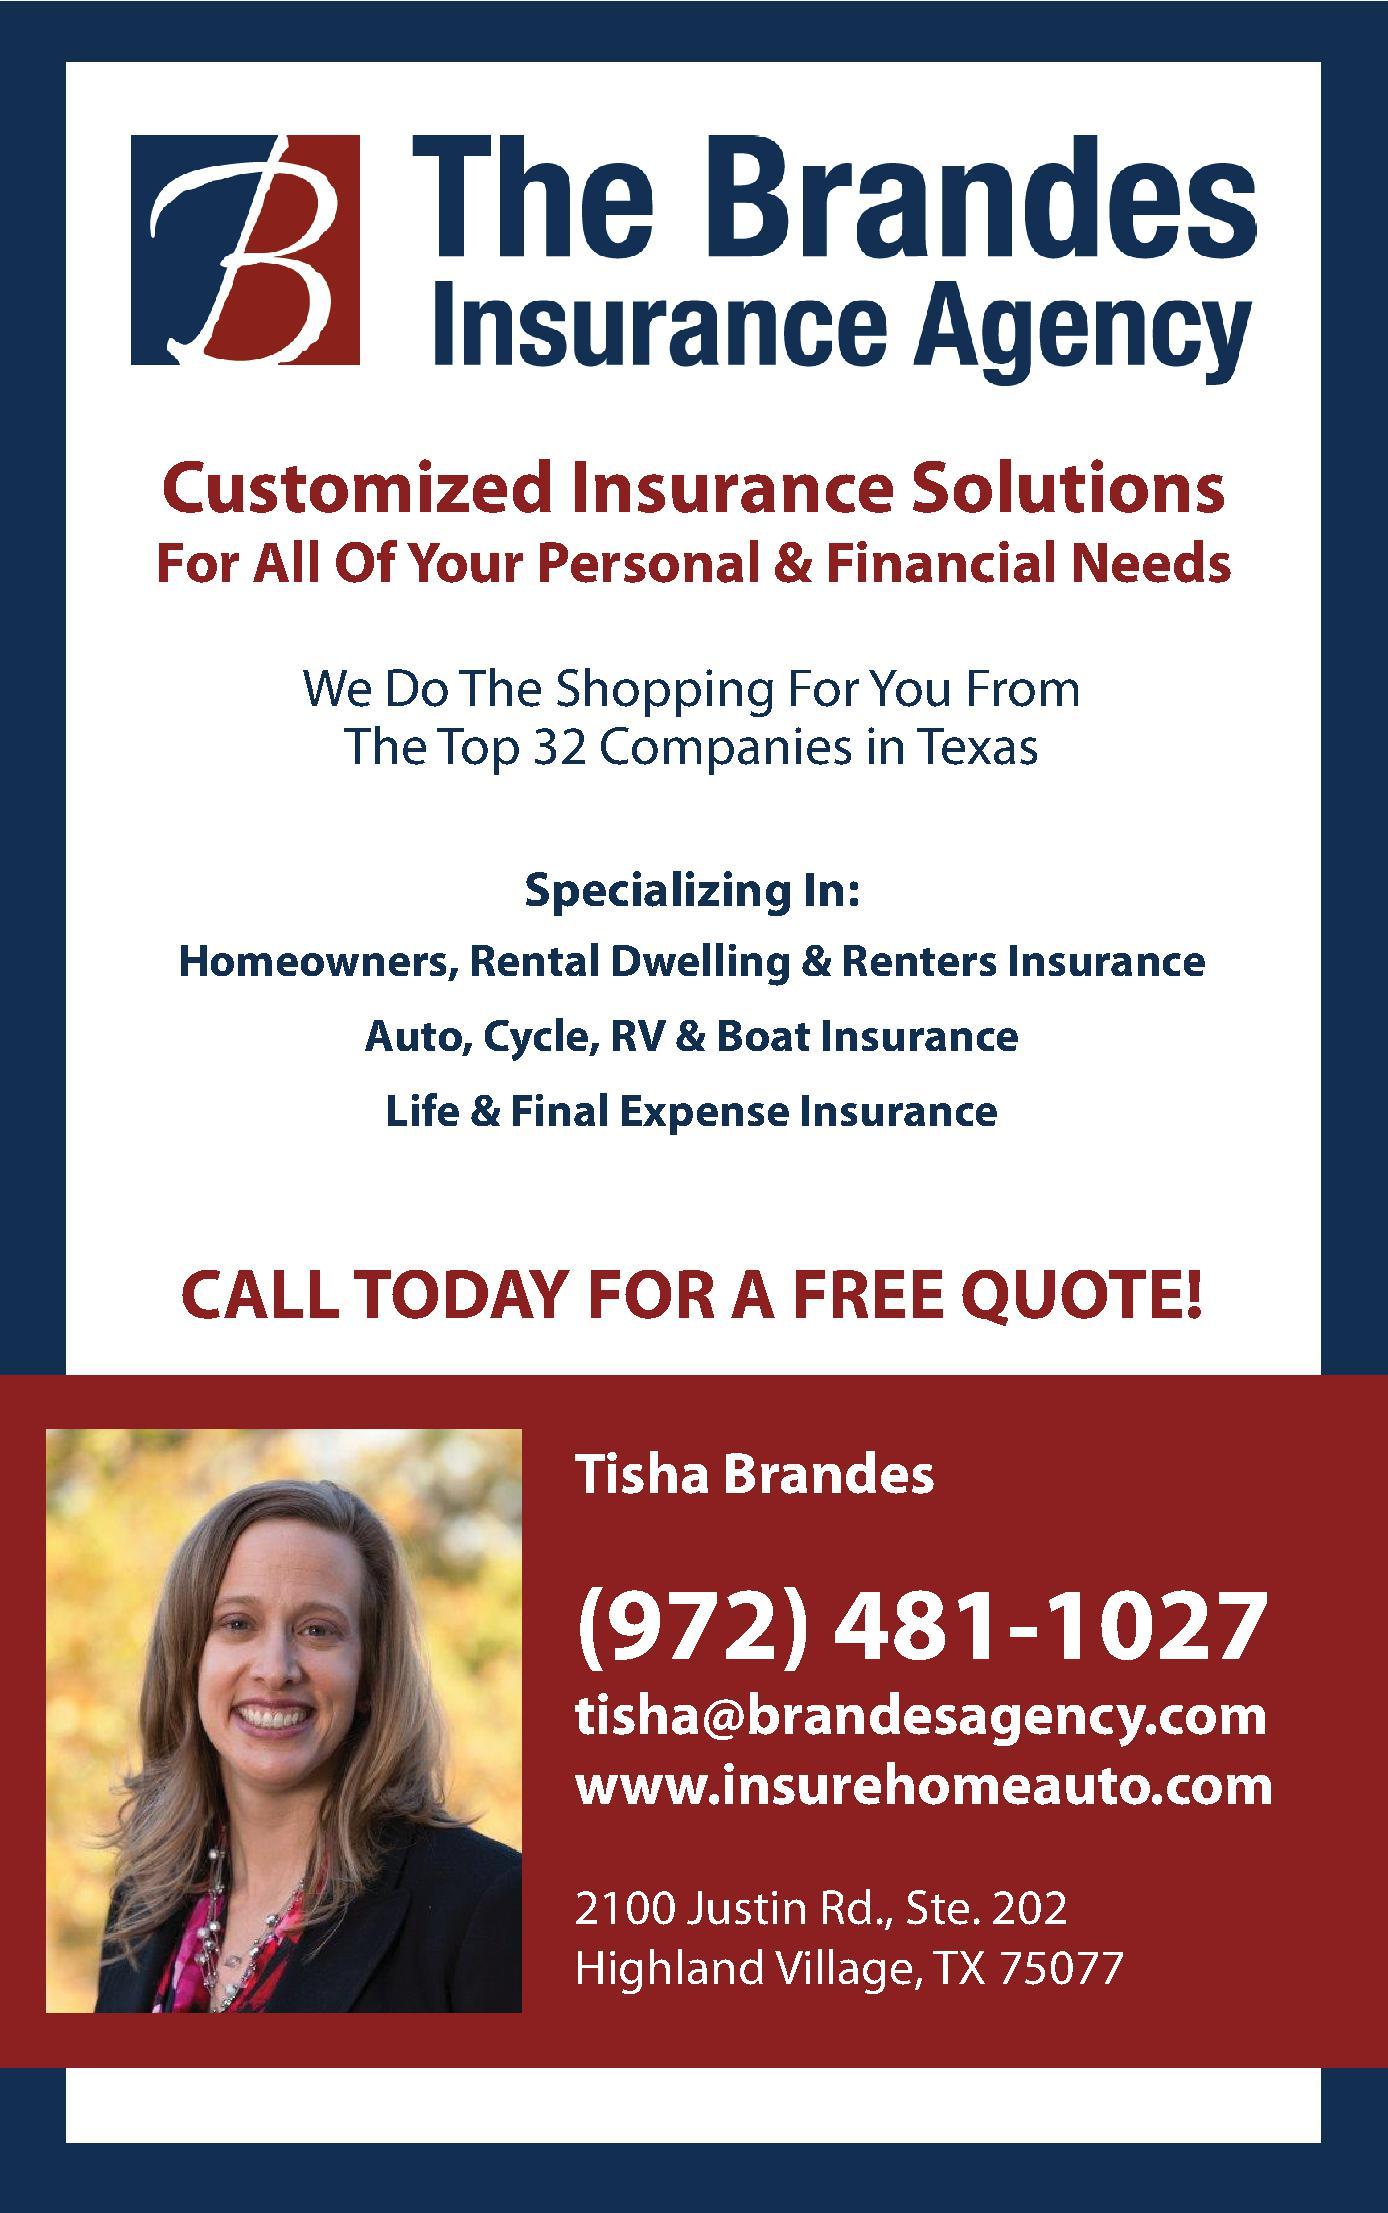 Tisha Brandes Insurance Services, LLC